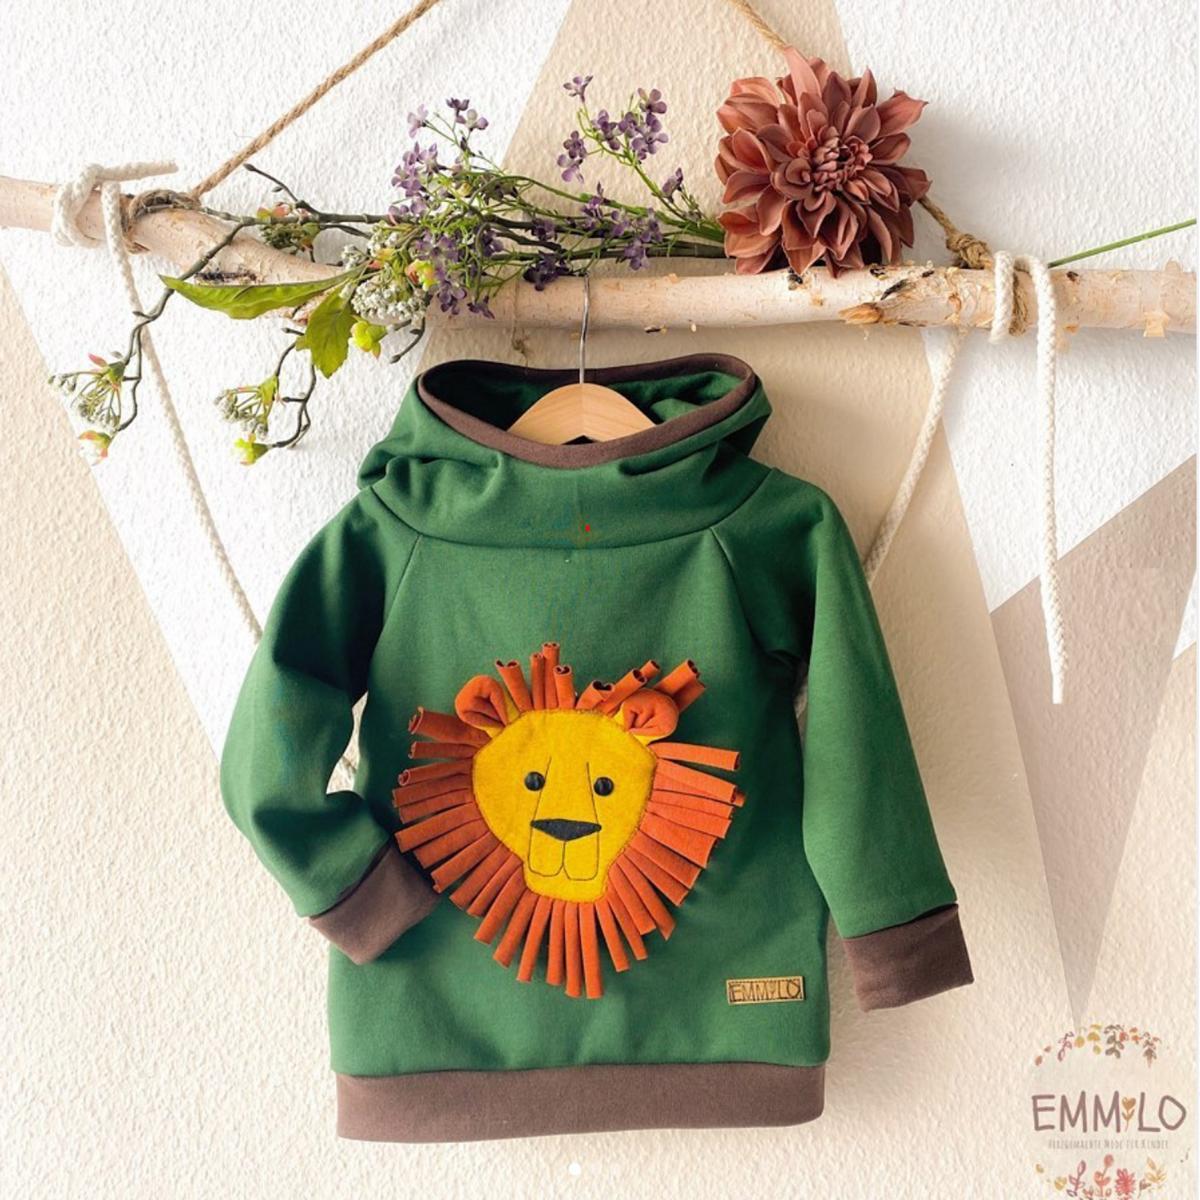 style hannover emmilo kindermode 4 - Emmilo - Kindermode in Döhren